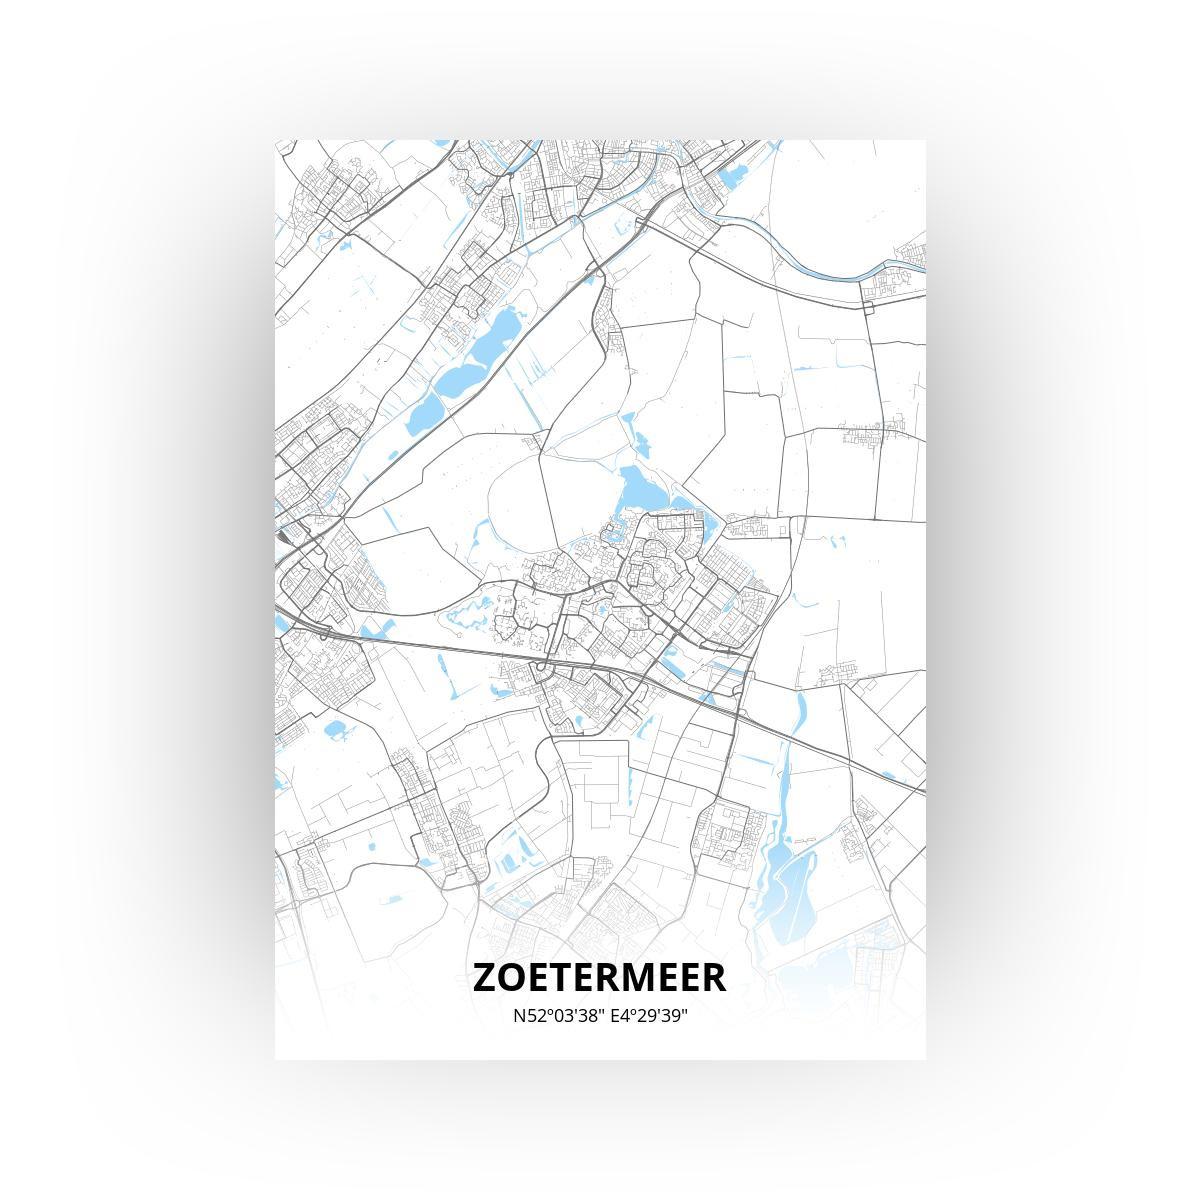 Zoetermeer print - Standaard stijl